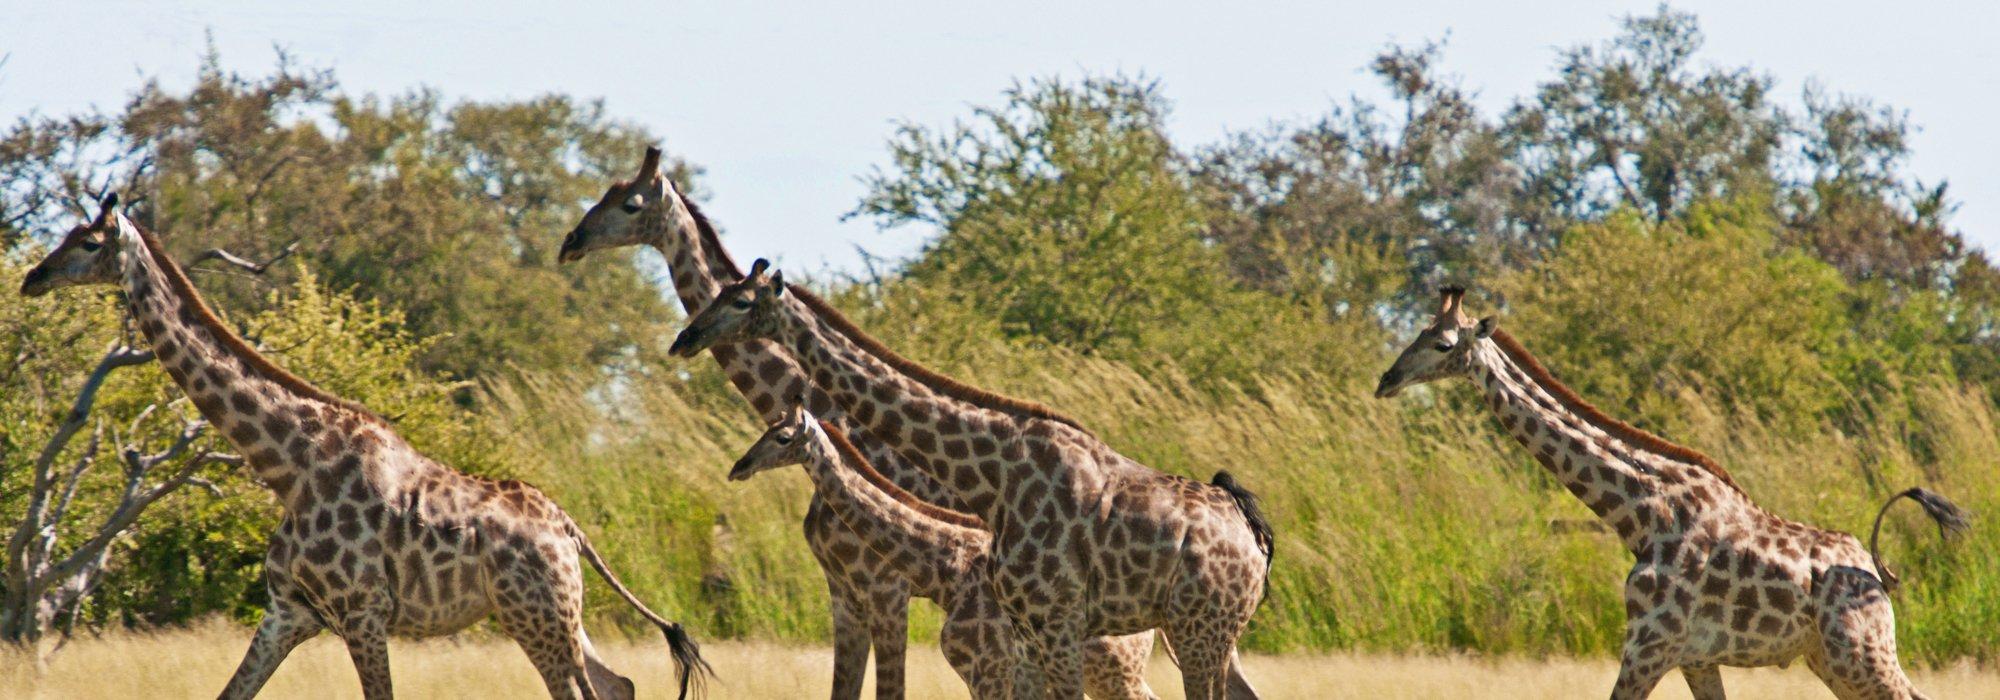 Giraffes on the Ngamo Plains